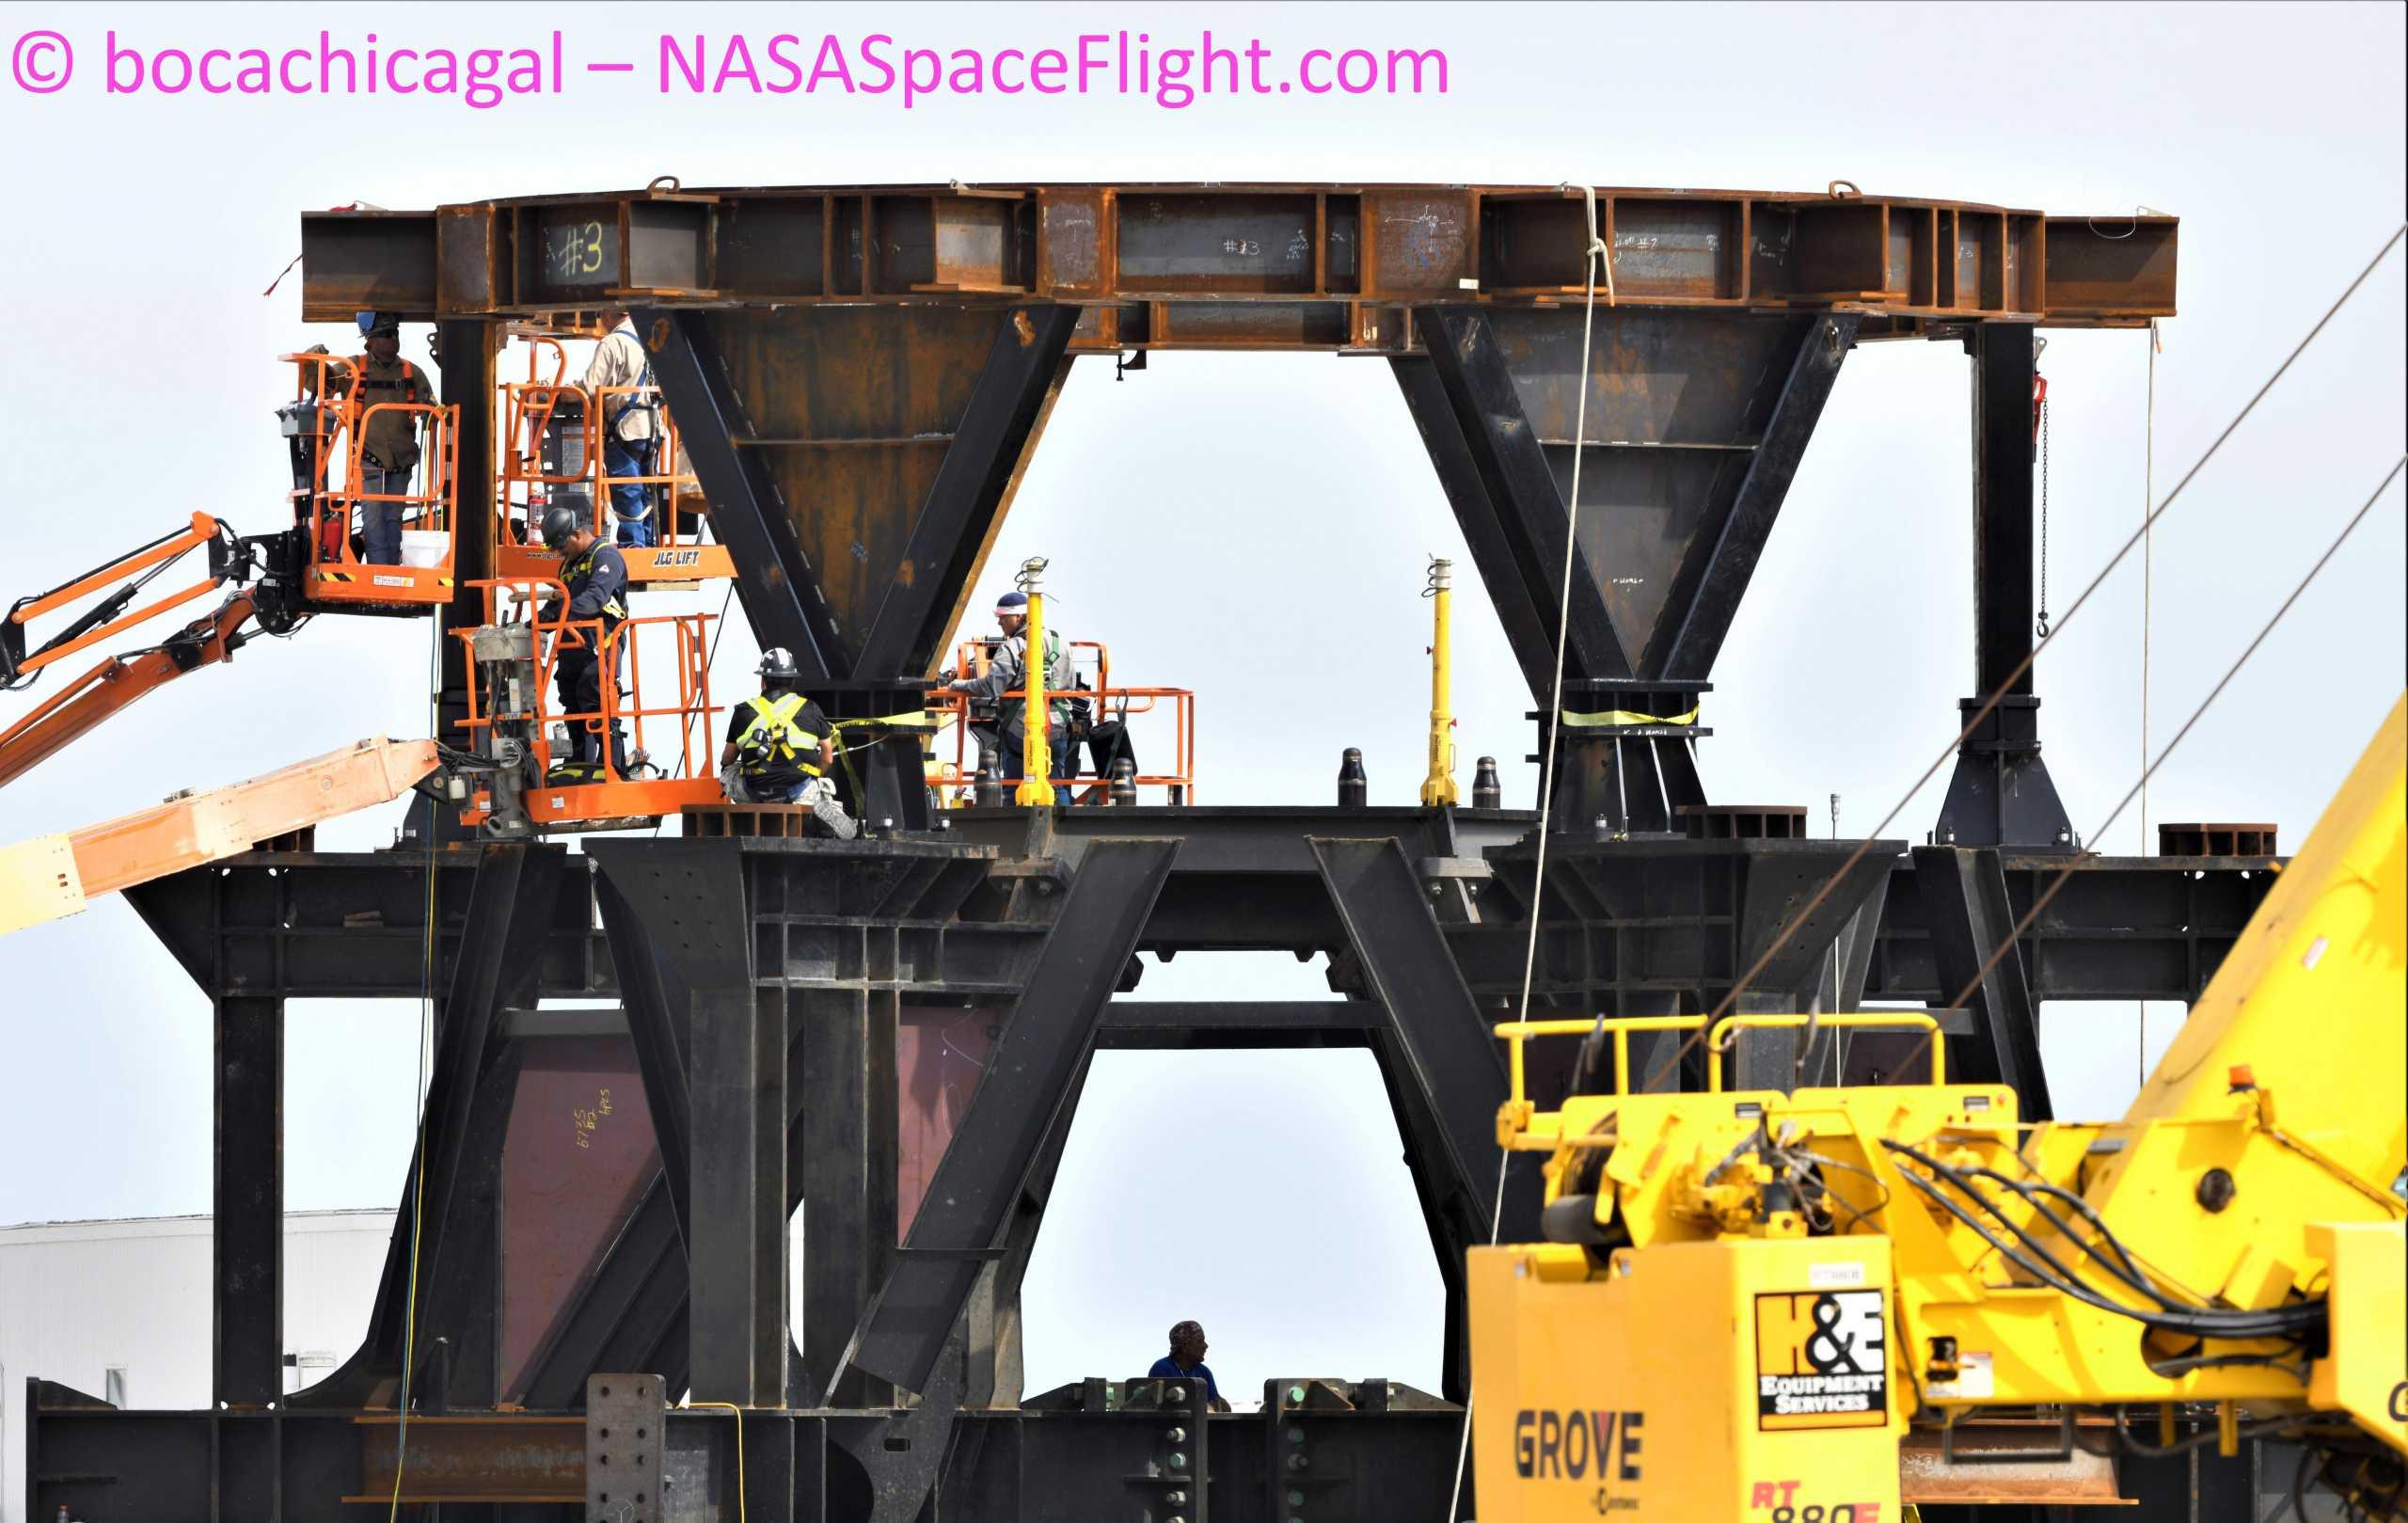 Starship Boca Chica 052521 (NASASpaceflight – bocachicagal) STA stand base work 1 (c)